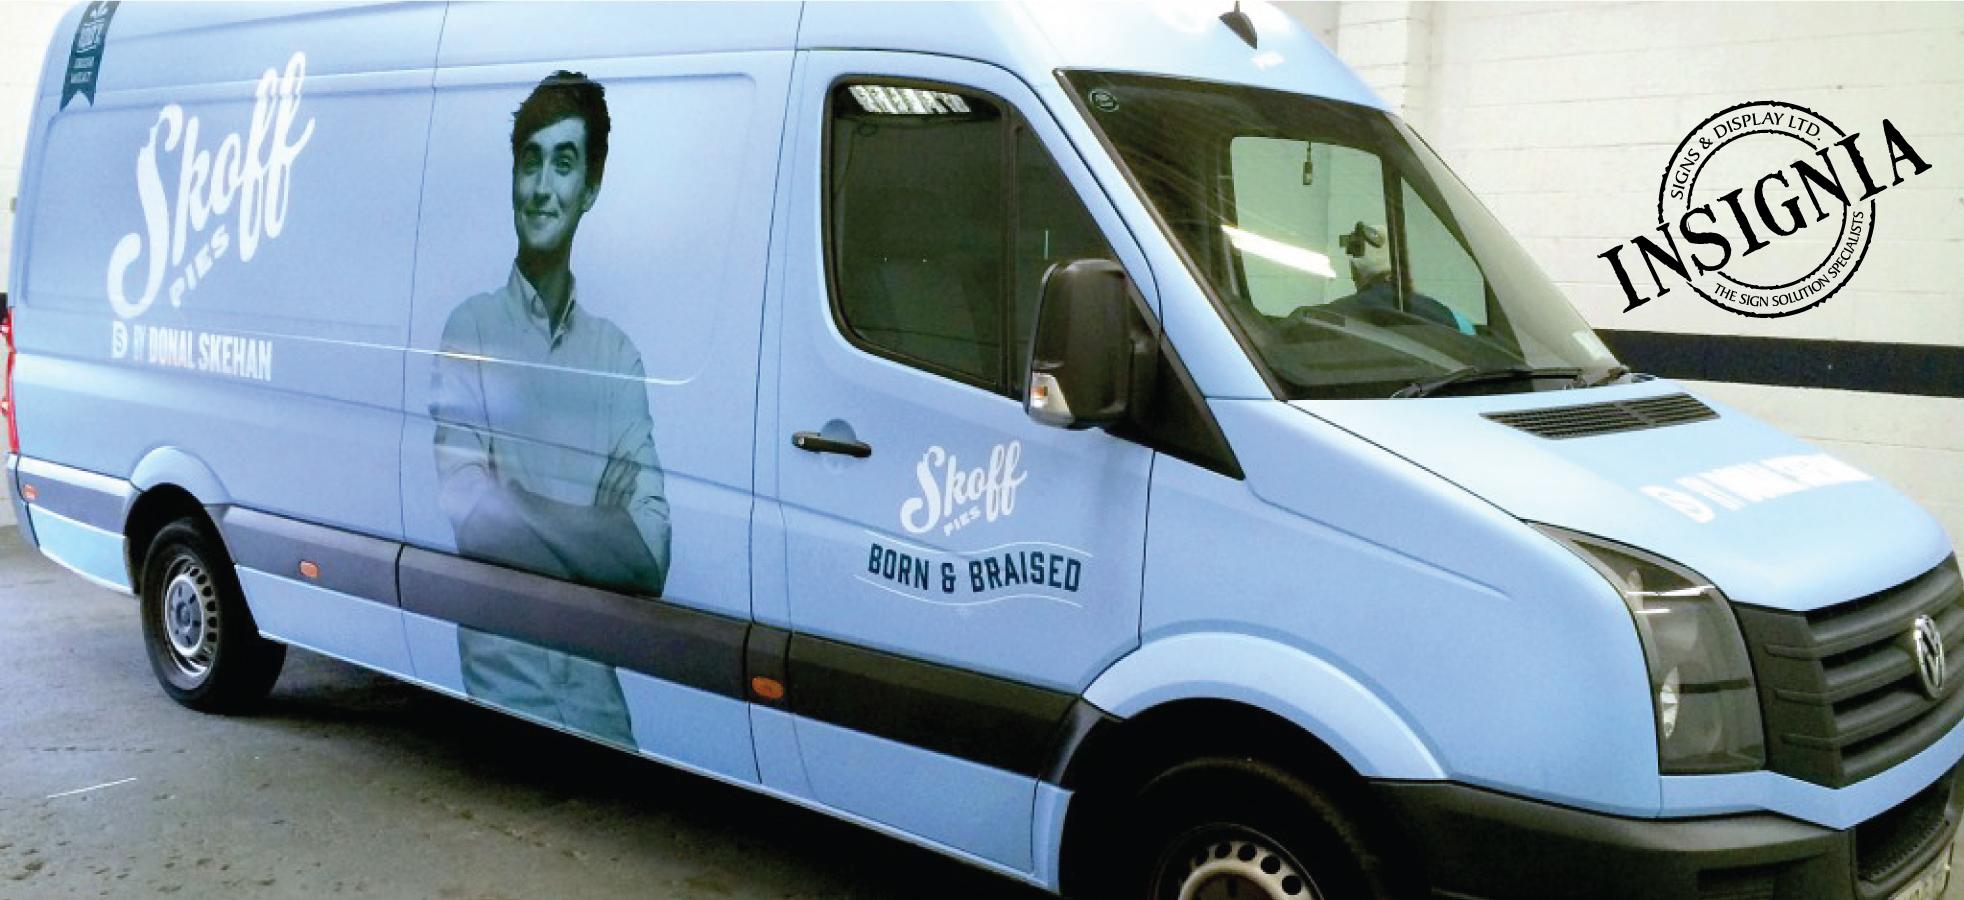 Vehicle Branding and Graphics